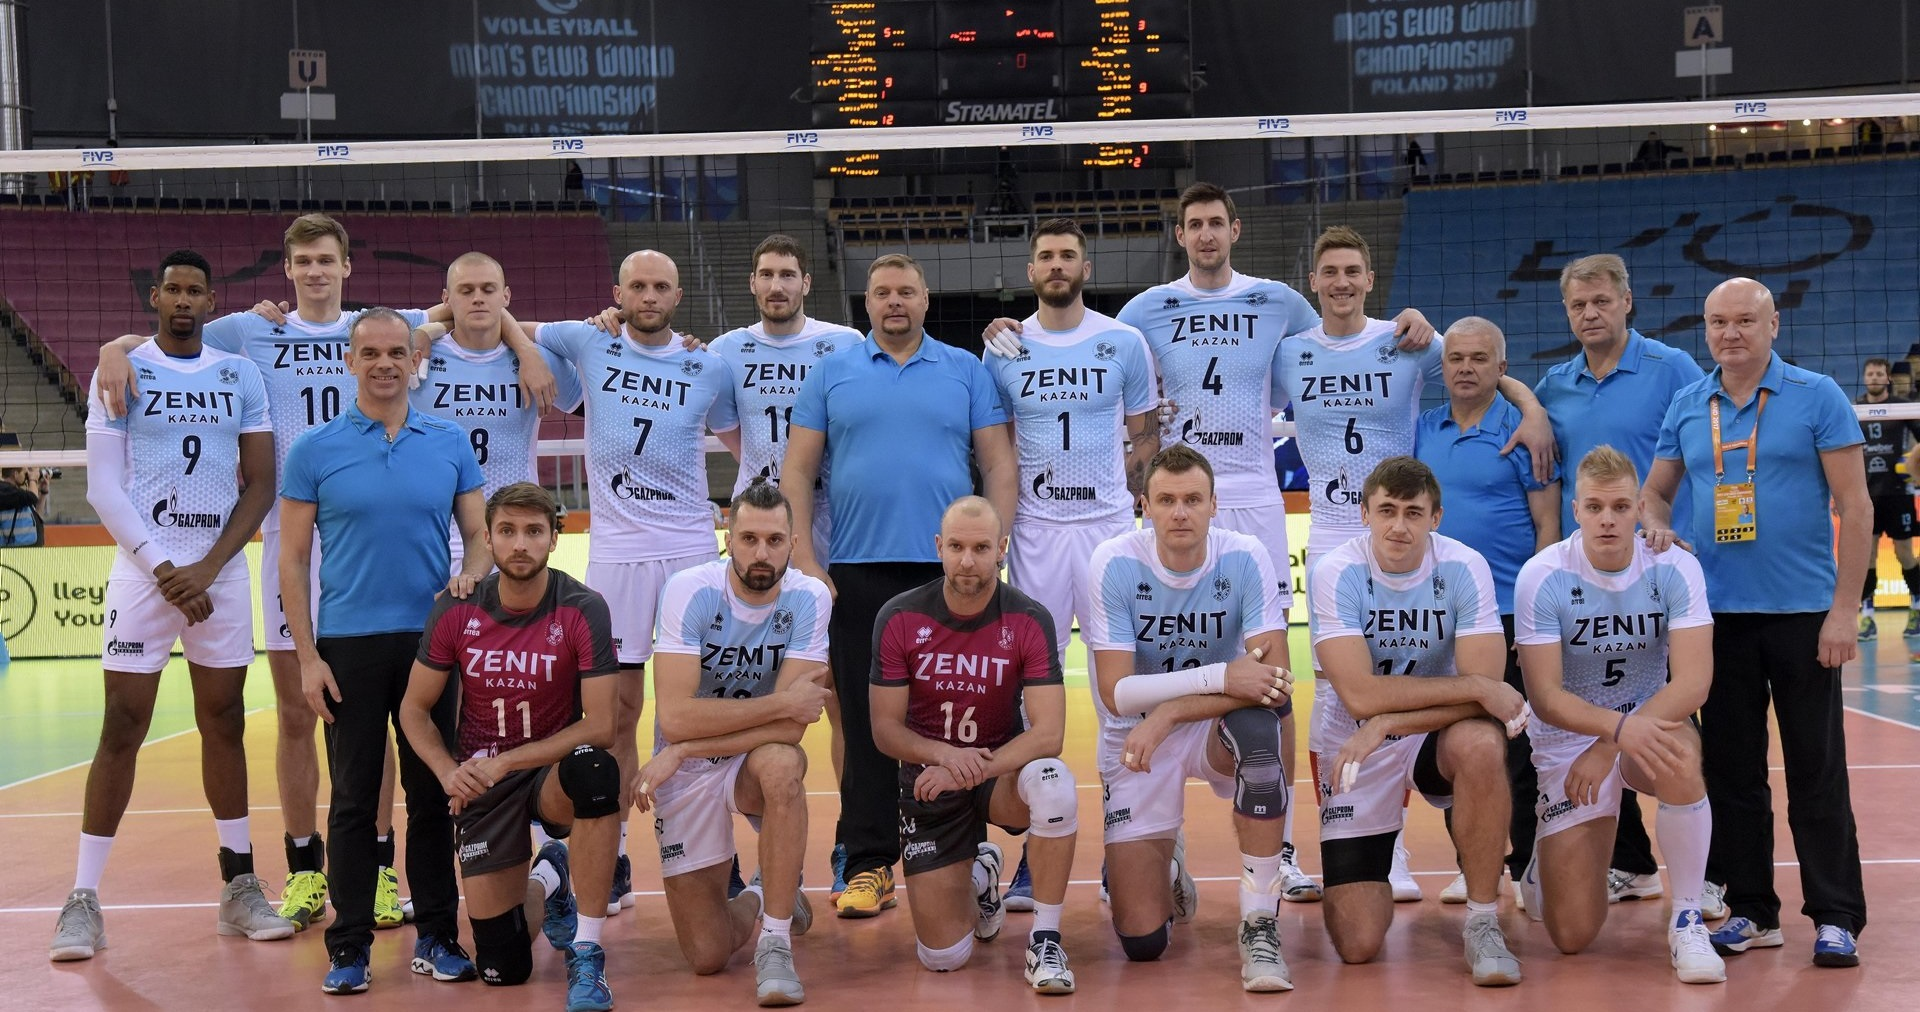 Zenit Kazan Personal Bolivar 3 0 Polish Volleyball Federation